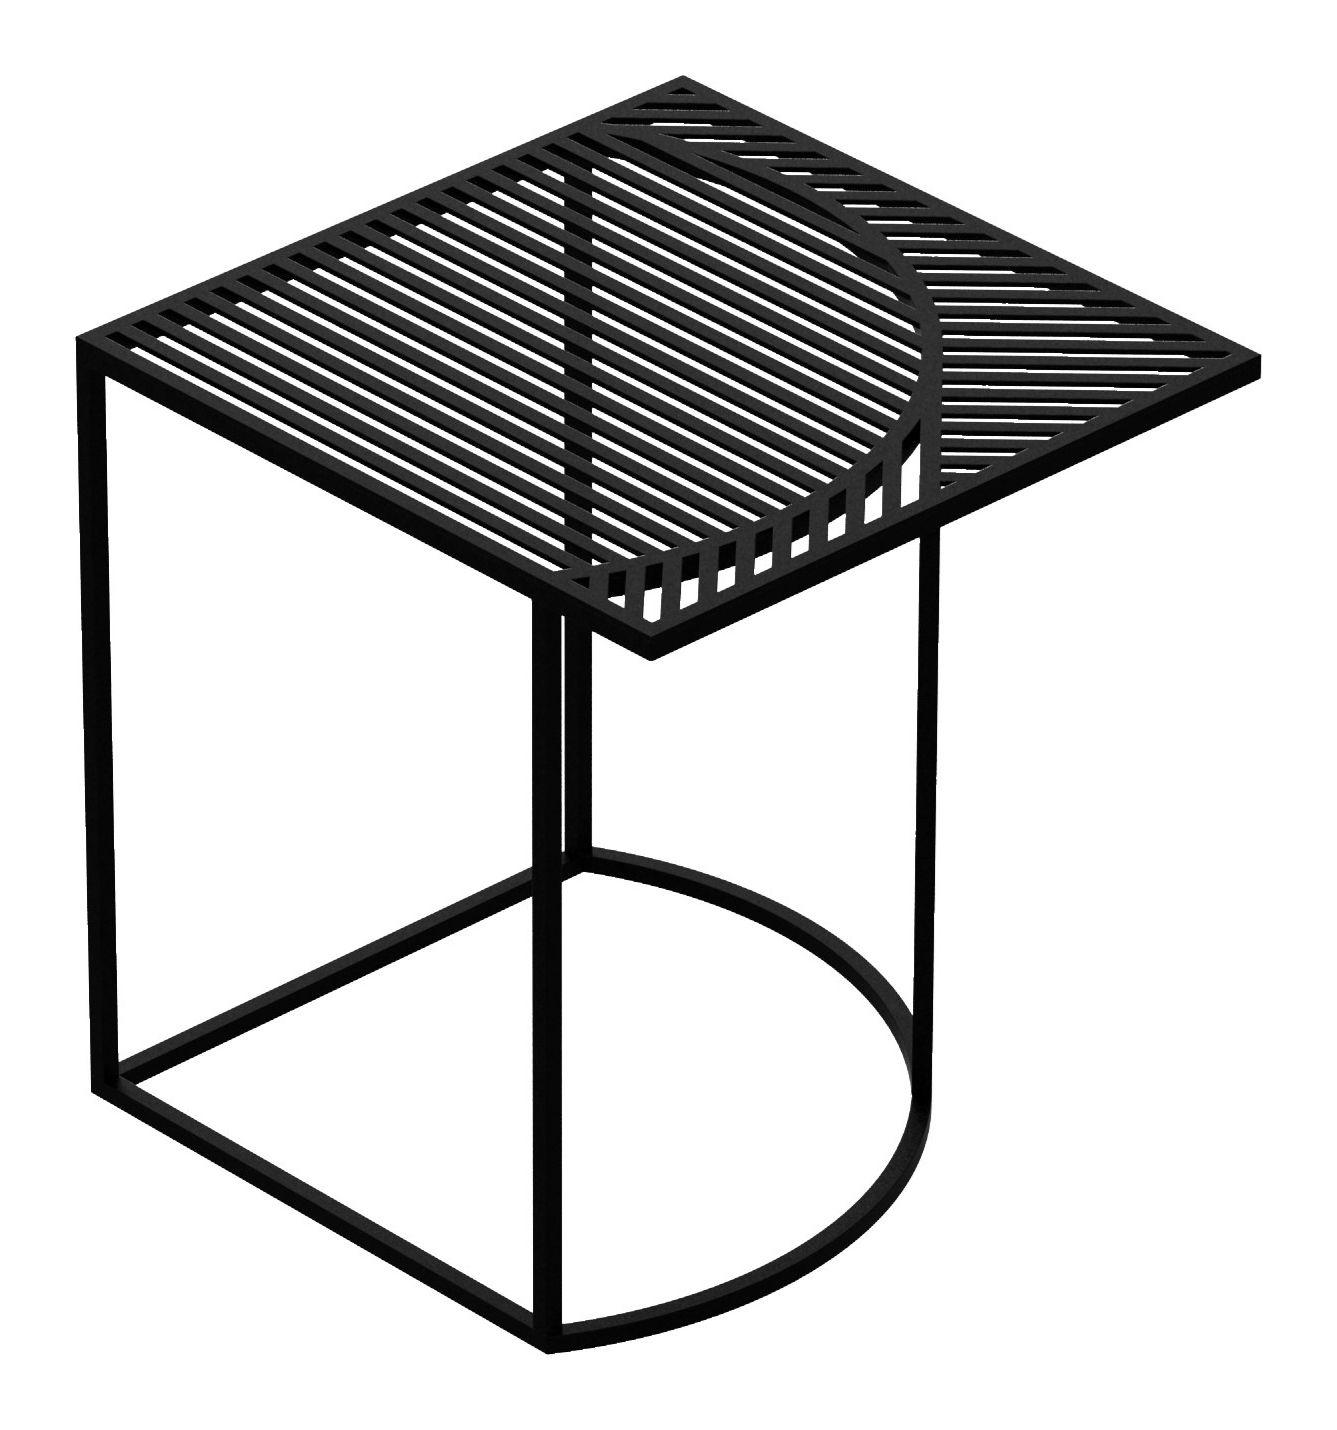 table basse iso b 46x46 x h 48 cm noir petite friture. Black Bedroom Furniture Sets. Home Design Ideas